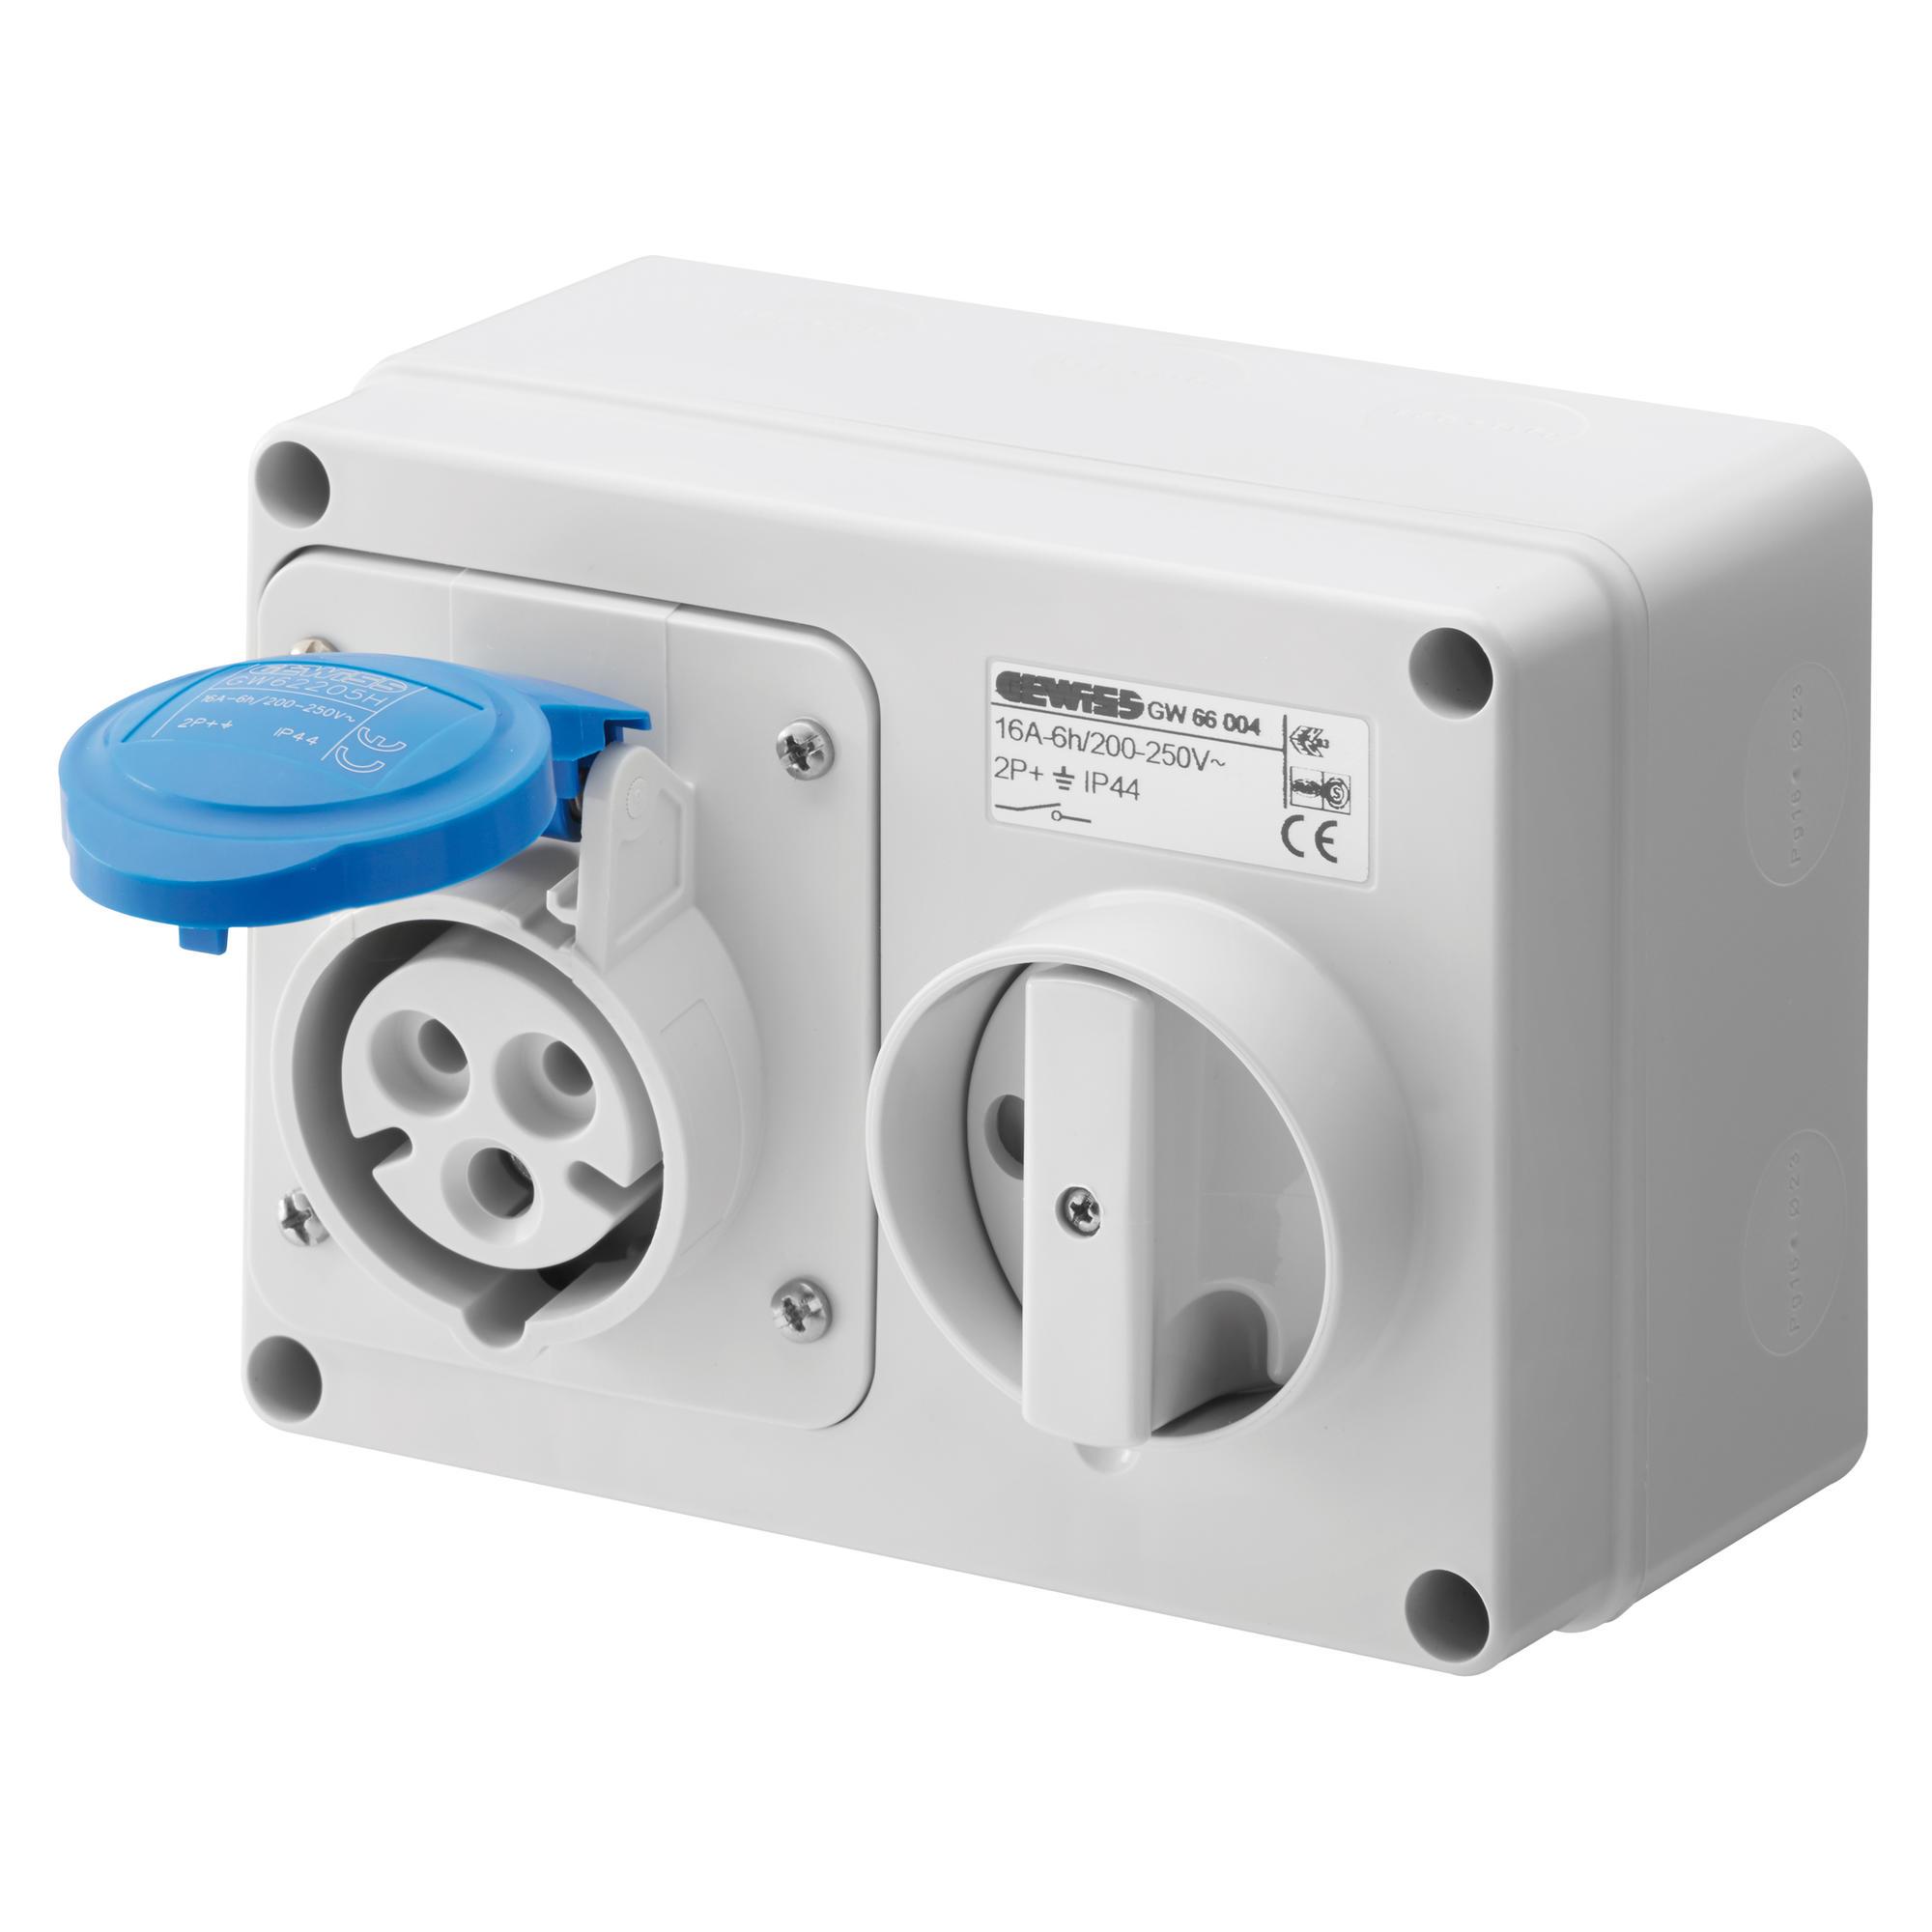 Socket Outlet Gw66015 Gewiss Wiring Diagram Switch Representative Image Download Photo